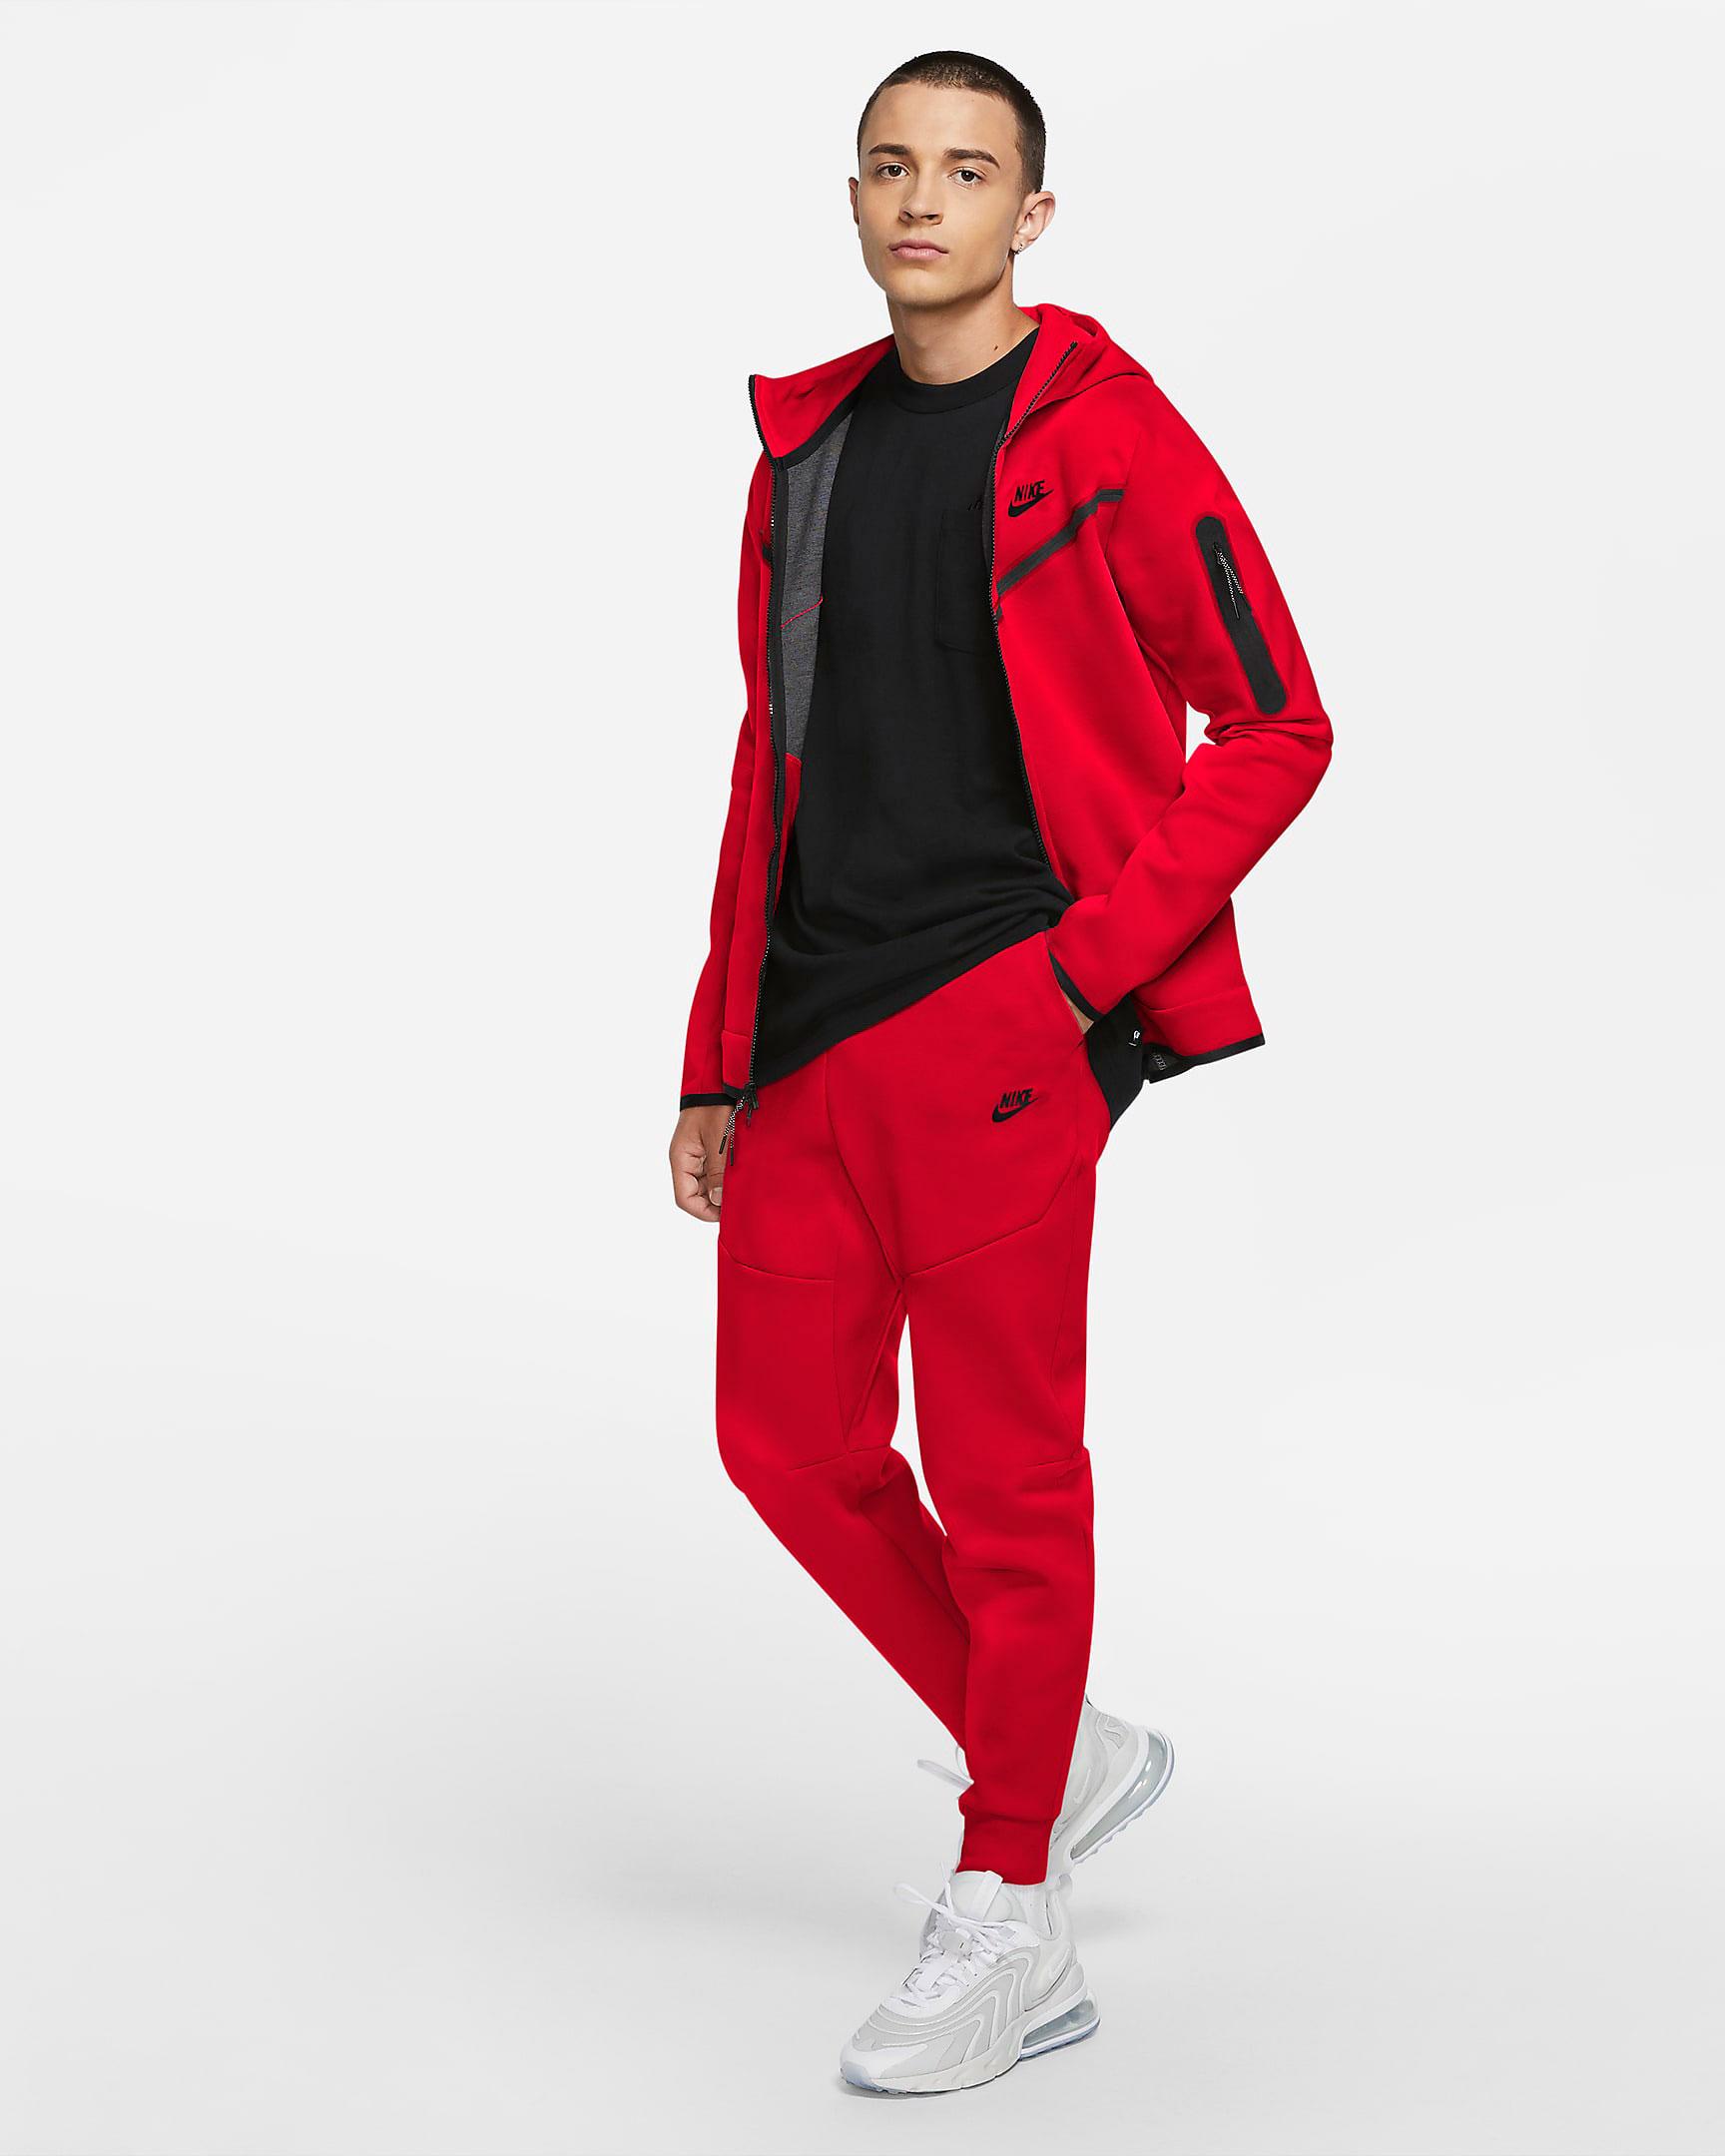 nike-tech-fleece-red-hoodie-jogger-pants